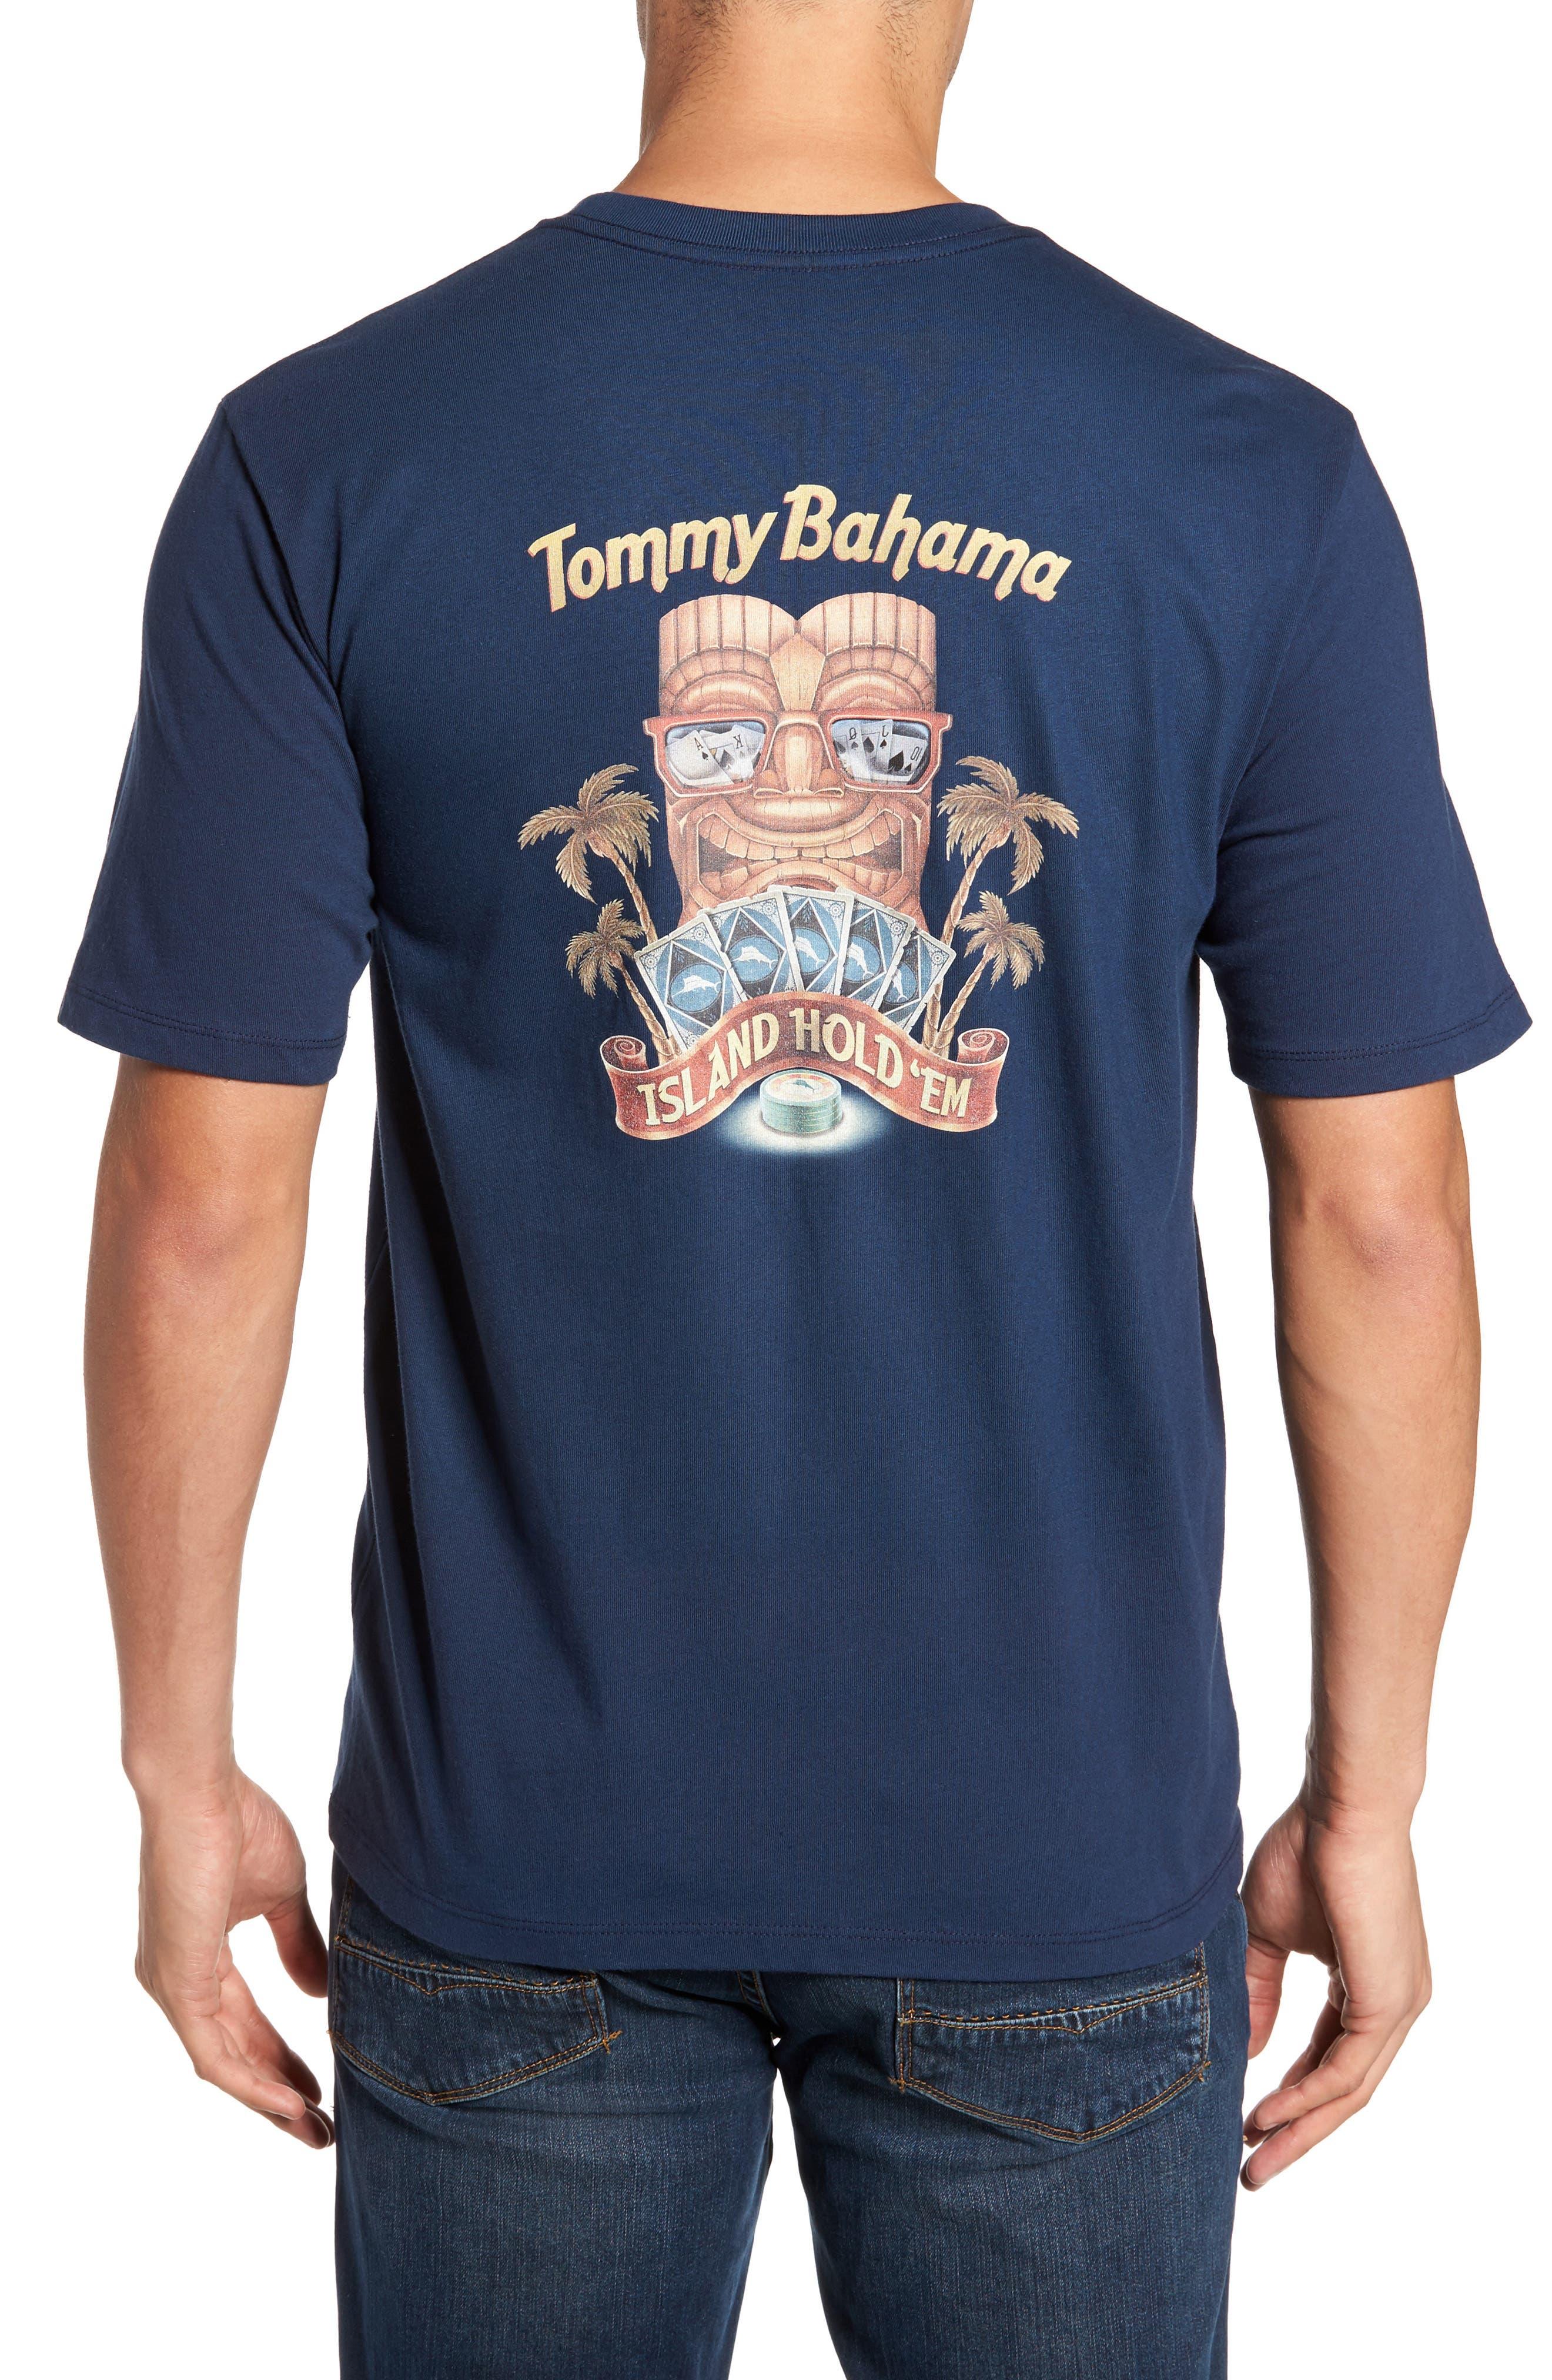 Tommy Bahama Island Hold 'Em Graphic T-Shirt